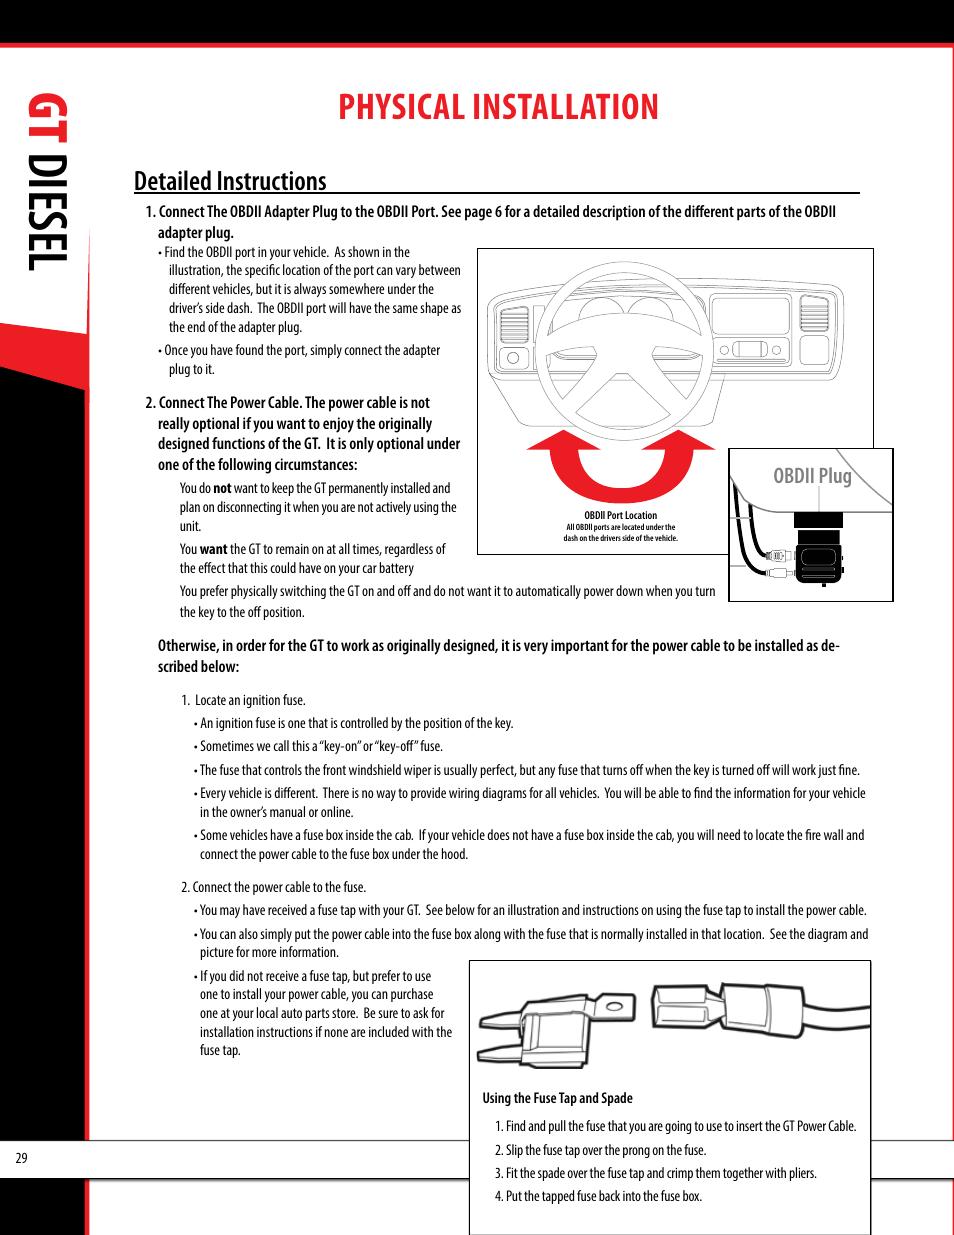 medium resolution of gt diesel physical installation obdii adapter plug installation diagram bully dog 40420 gauge